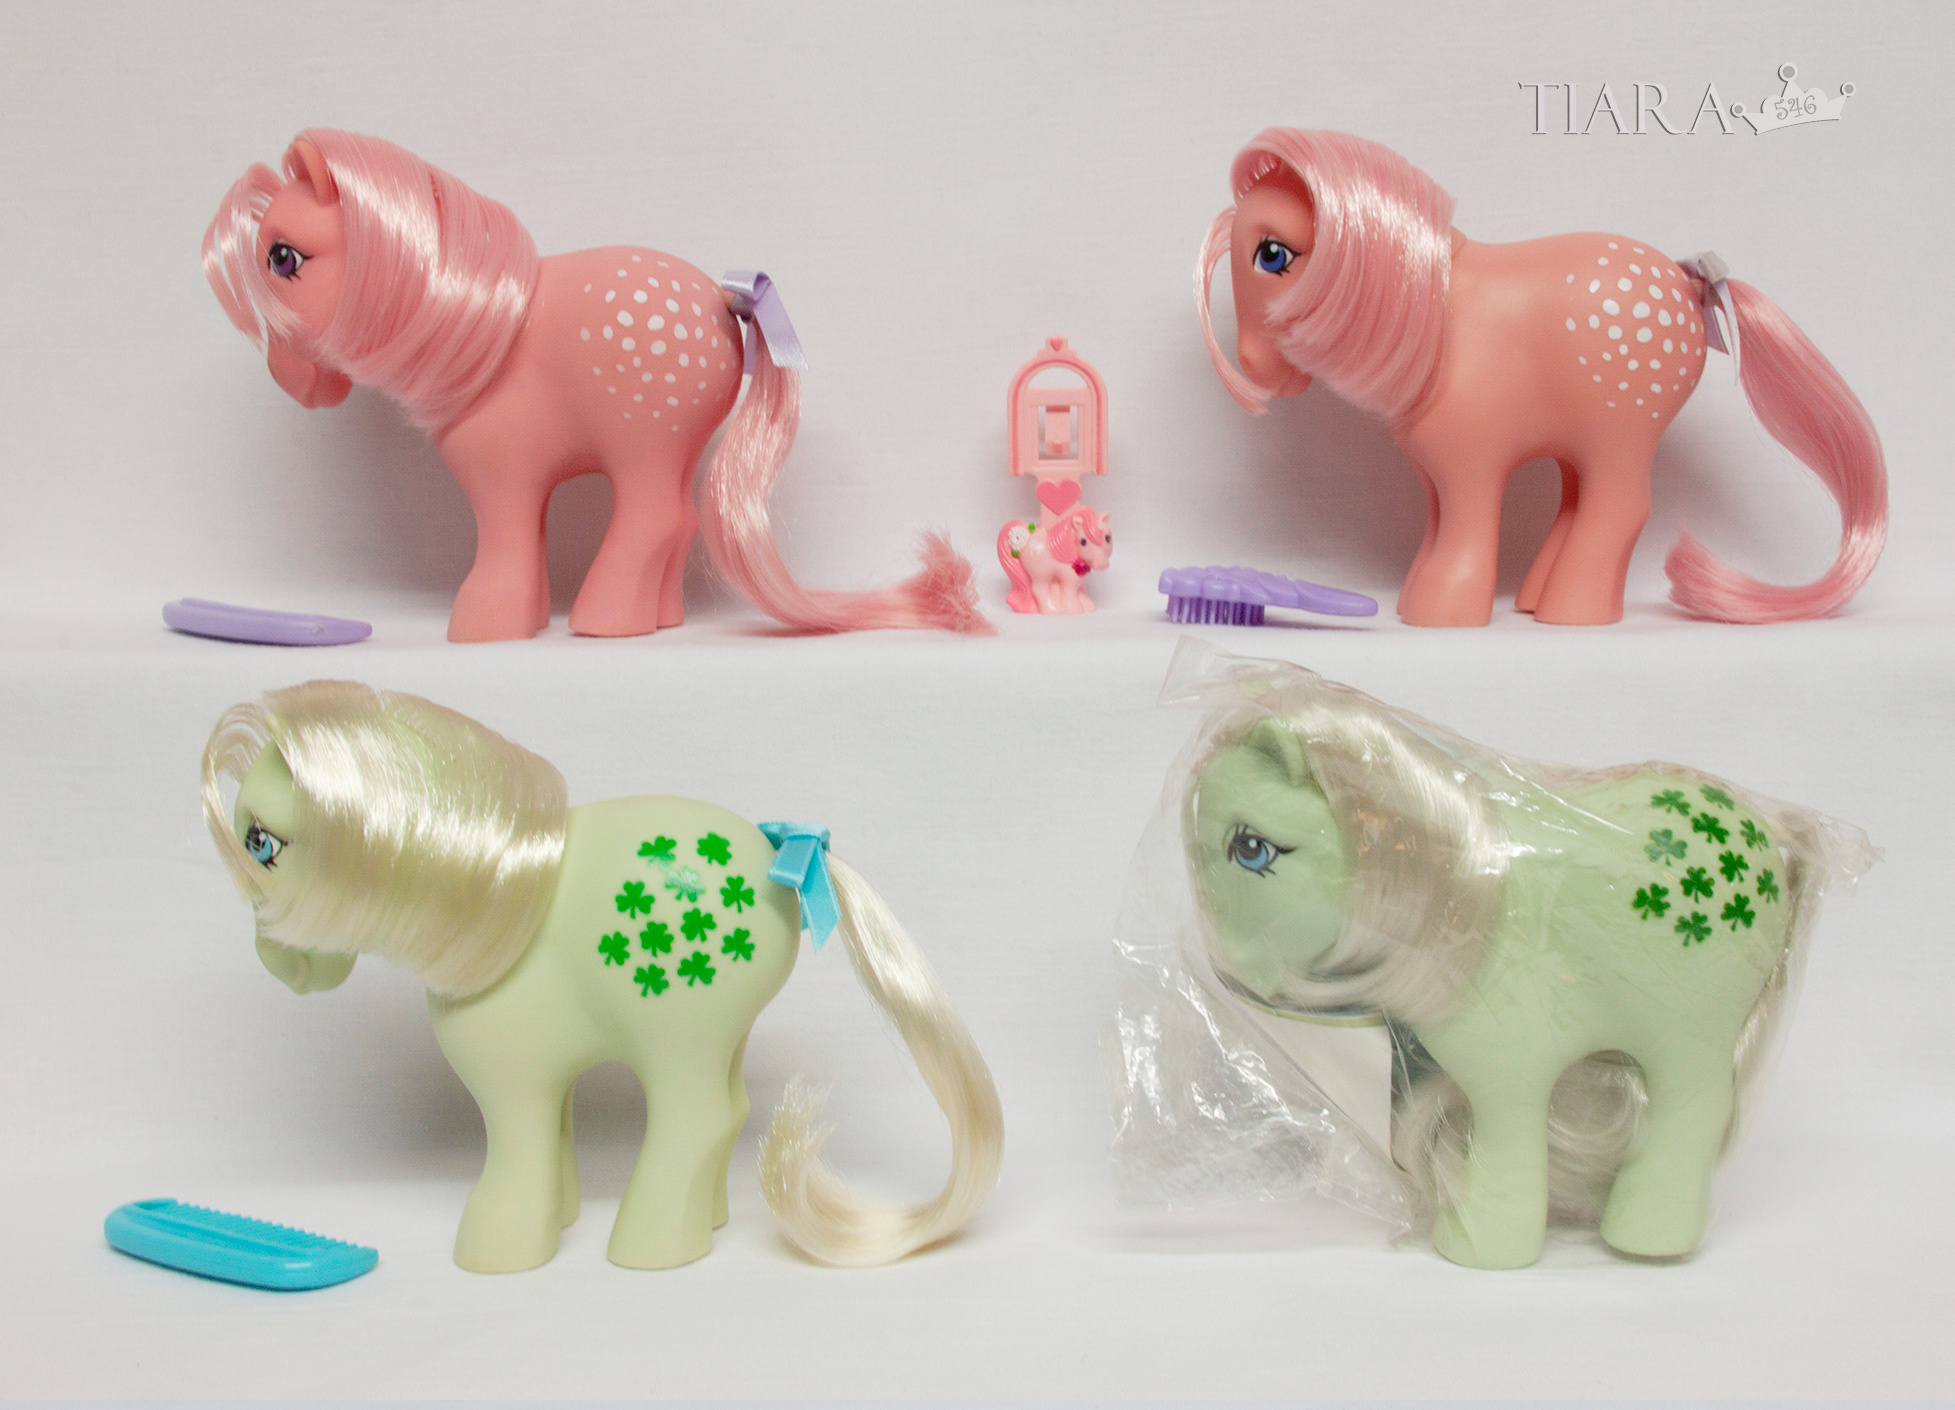 Tiara546s Collection